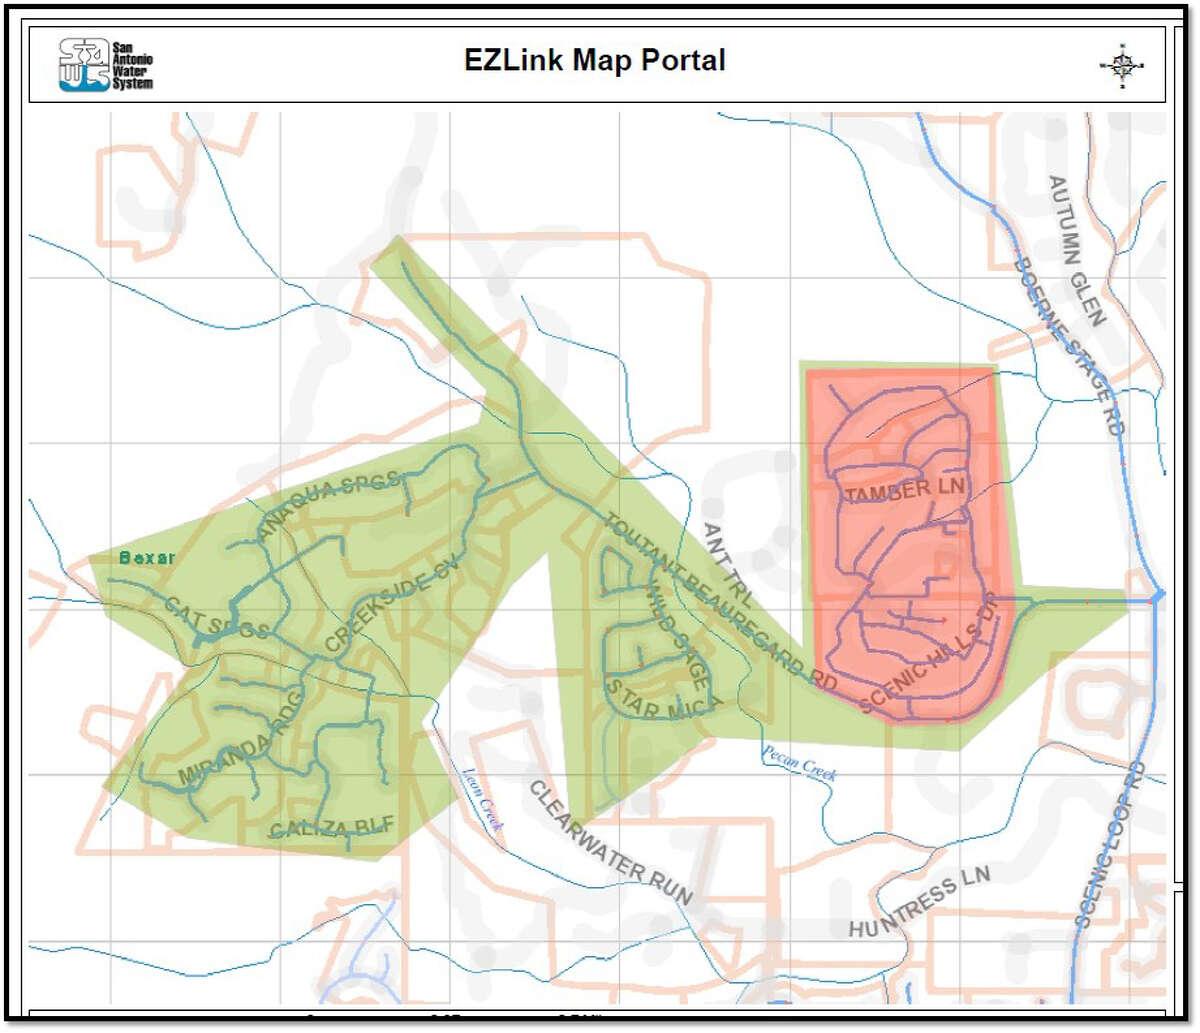 Water main break causes boil water order for areas of San Antonio.